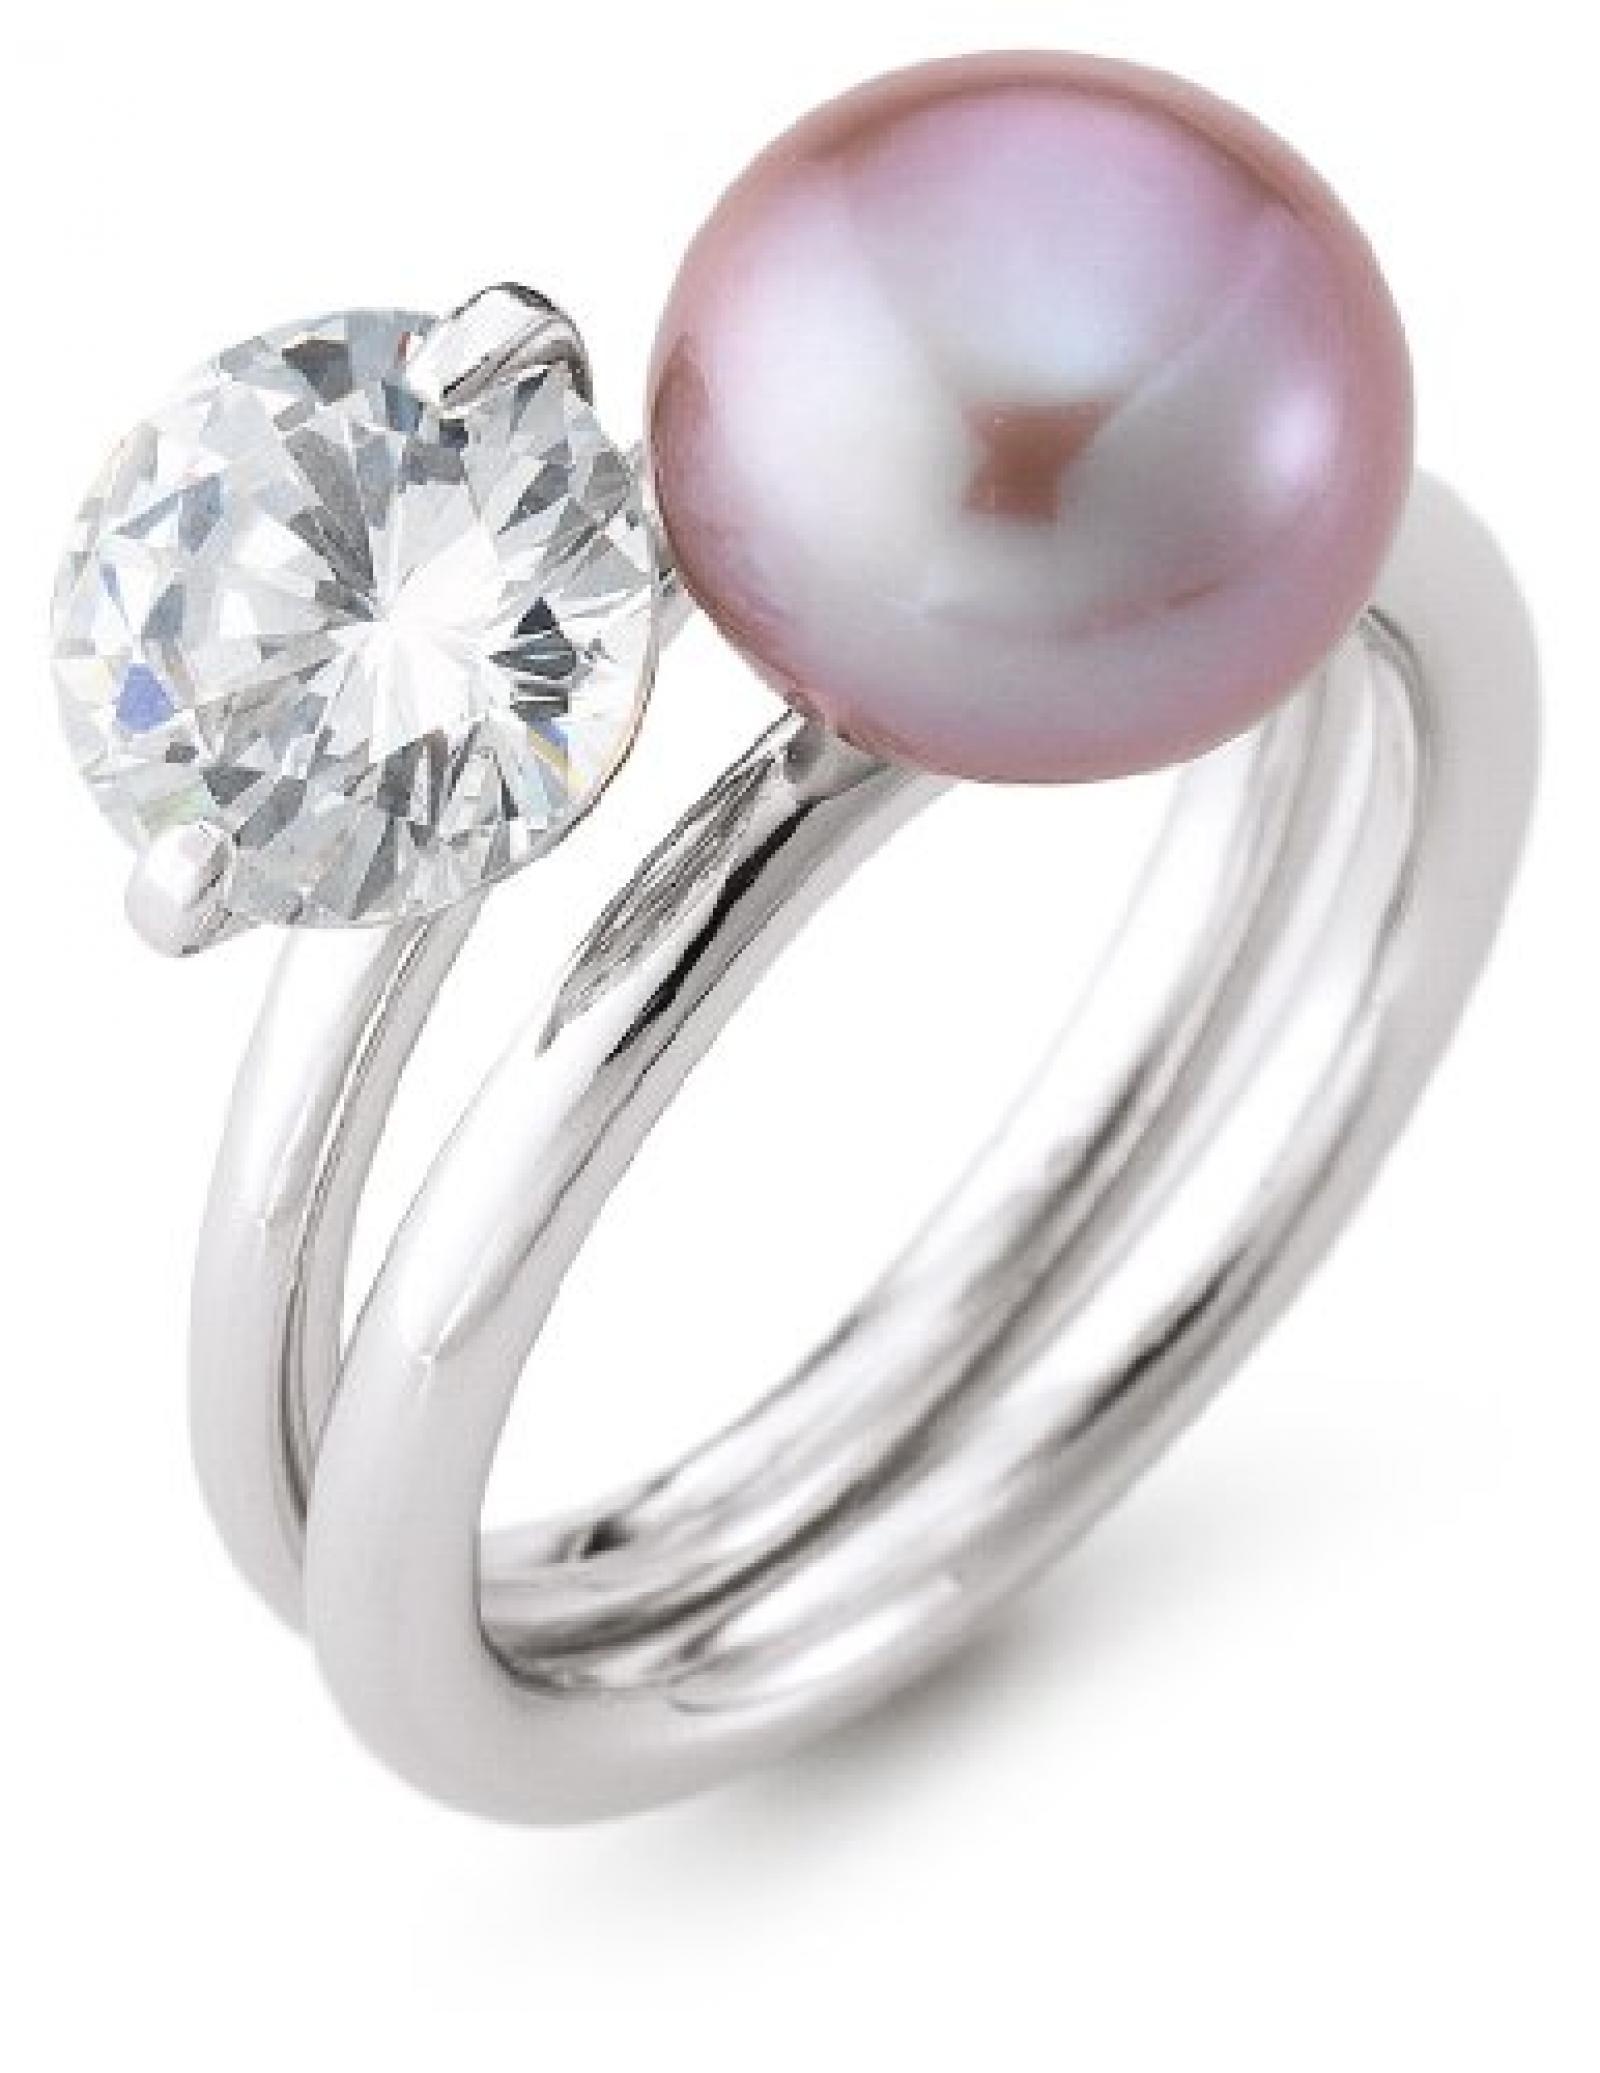 Adriana Damen-Ring Romantica Süßwasser Zuchtperle Zirkonia 2er Set 925 Sterling-Silber Gr. 58 R19-58